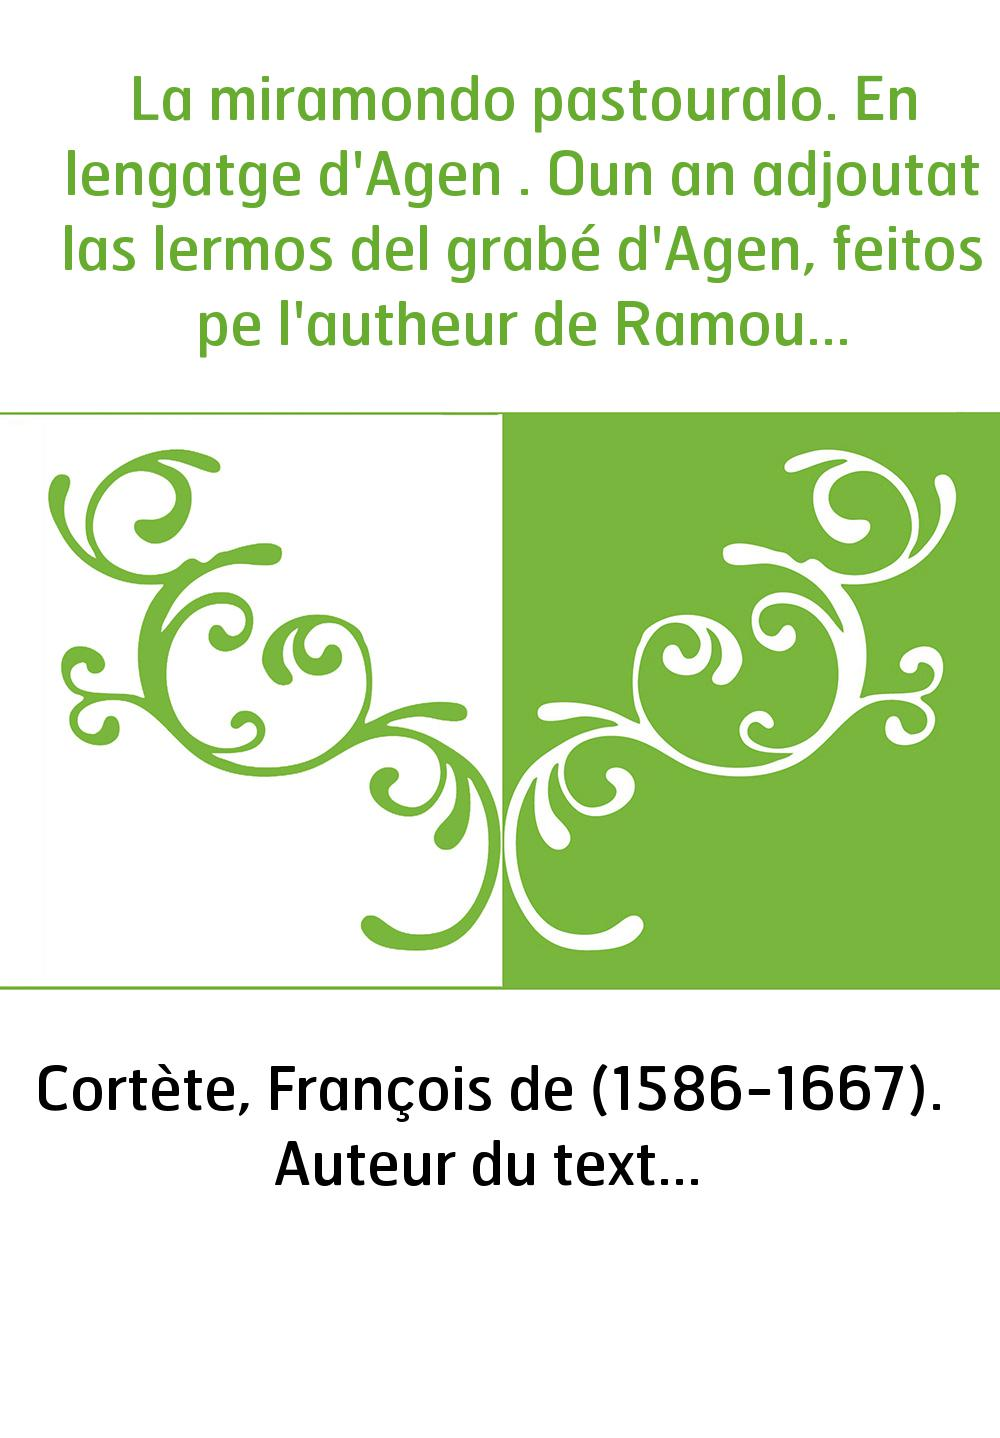 La miramondo pastouralo. En lengatge d'Agen . Oun an adjoutat las lermos del grabé d'Agen, feitos pe l'autheur de Ramounet & Mir